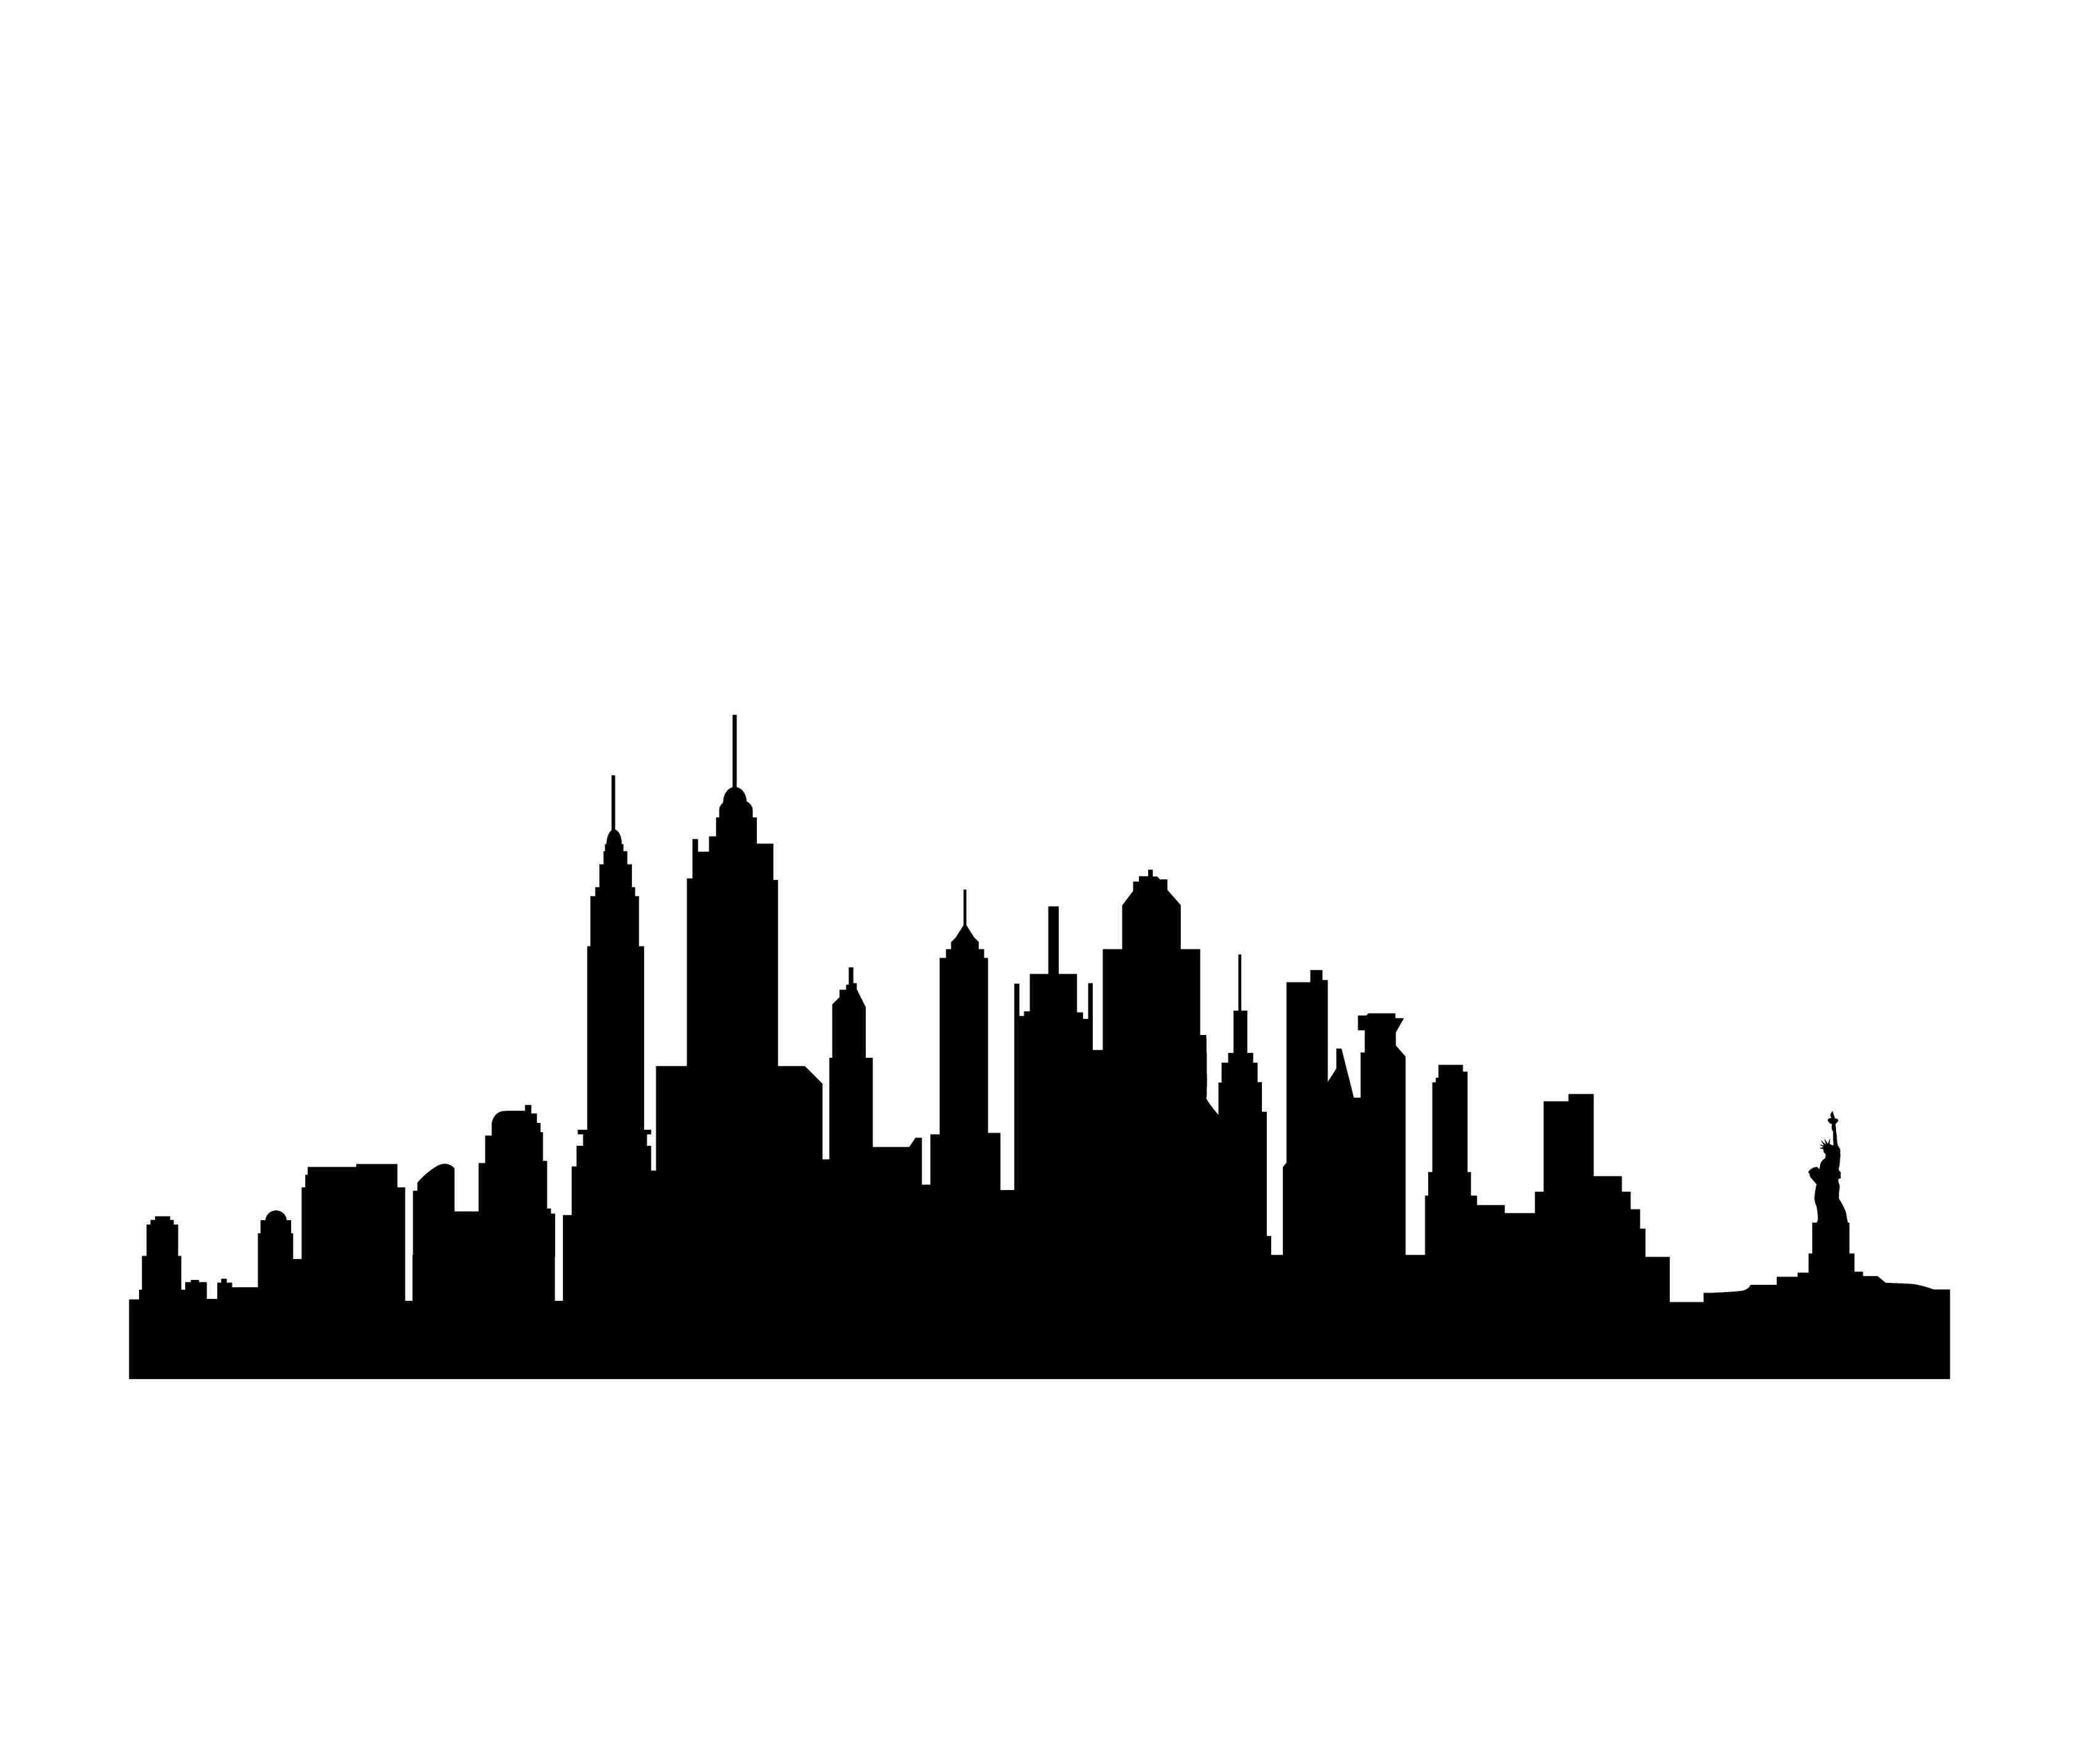 3413x2844 Silhouette Of Nyc Skyline